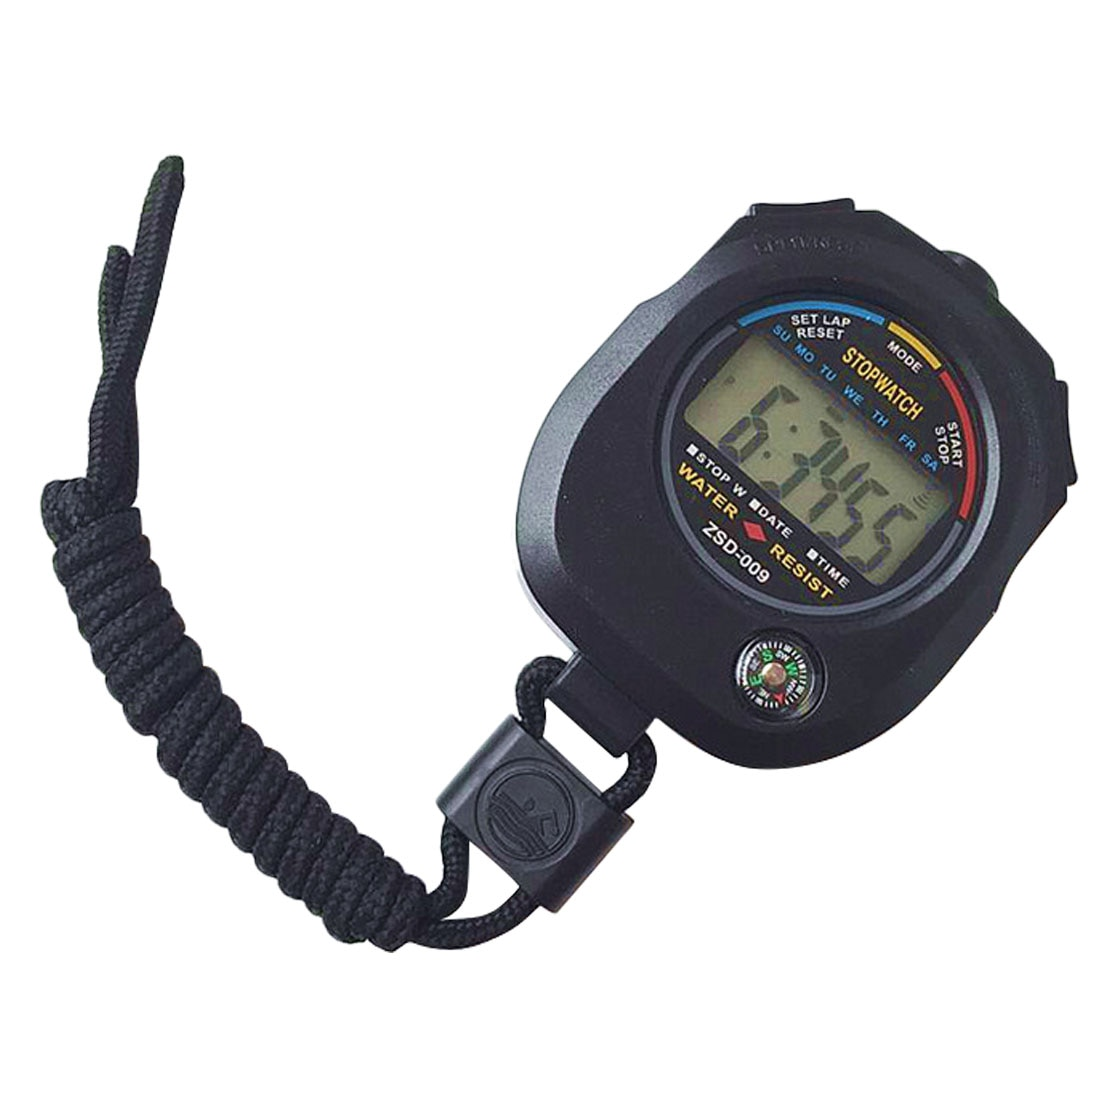 Cronómetro Digital deportivo LCD, cronómetro, cronómetro deportivo de mano con correa profesional